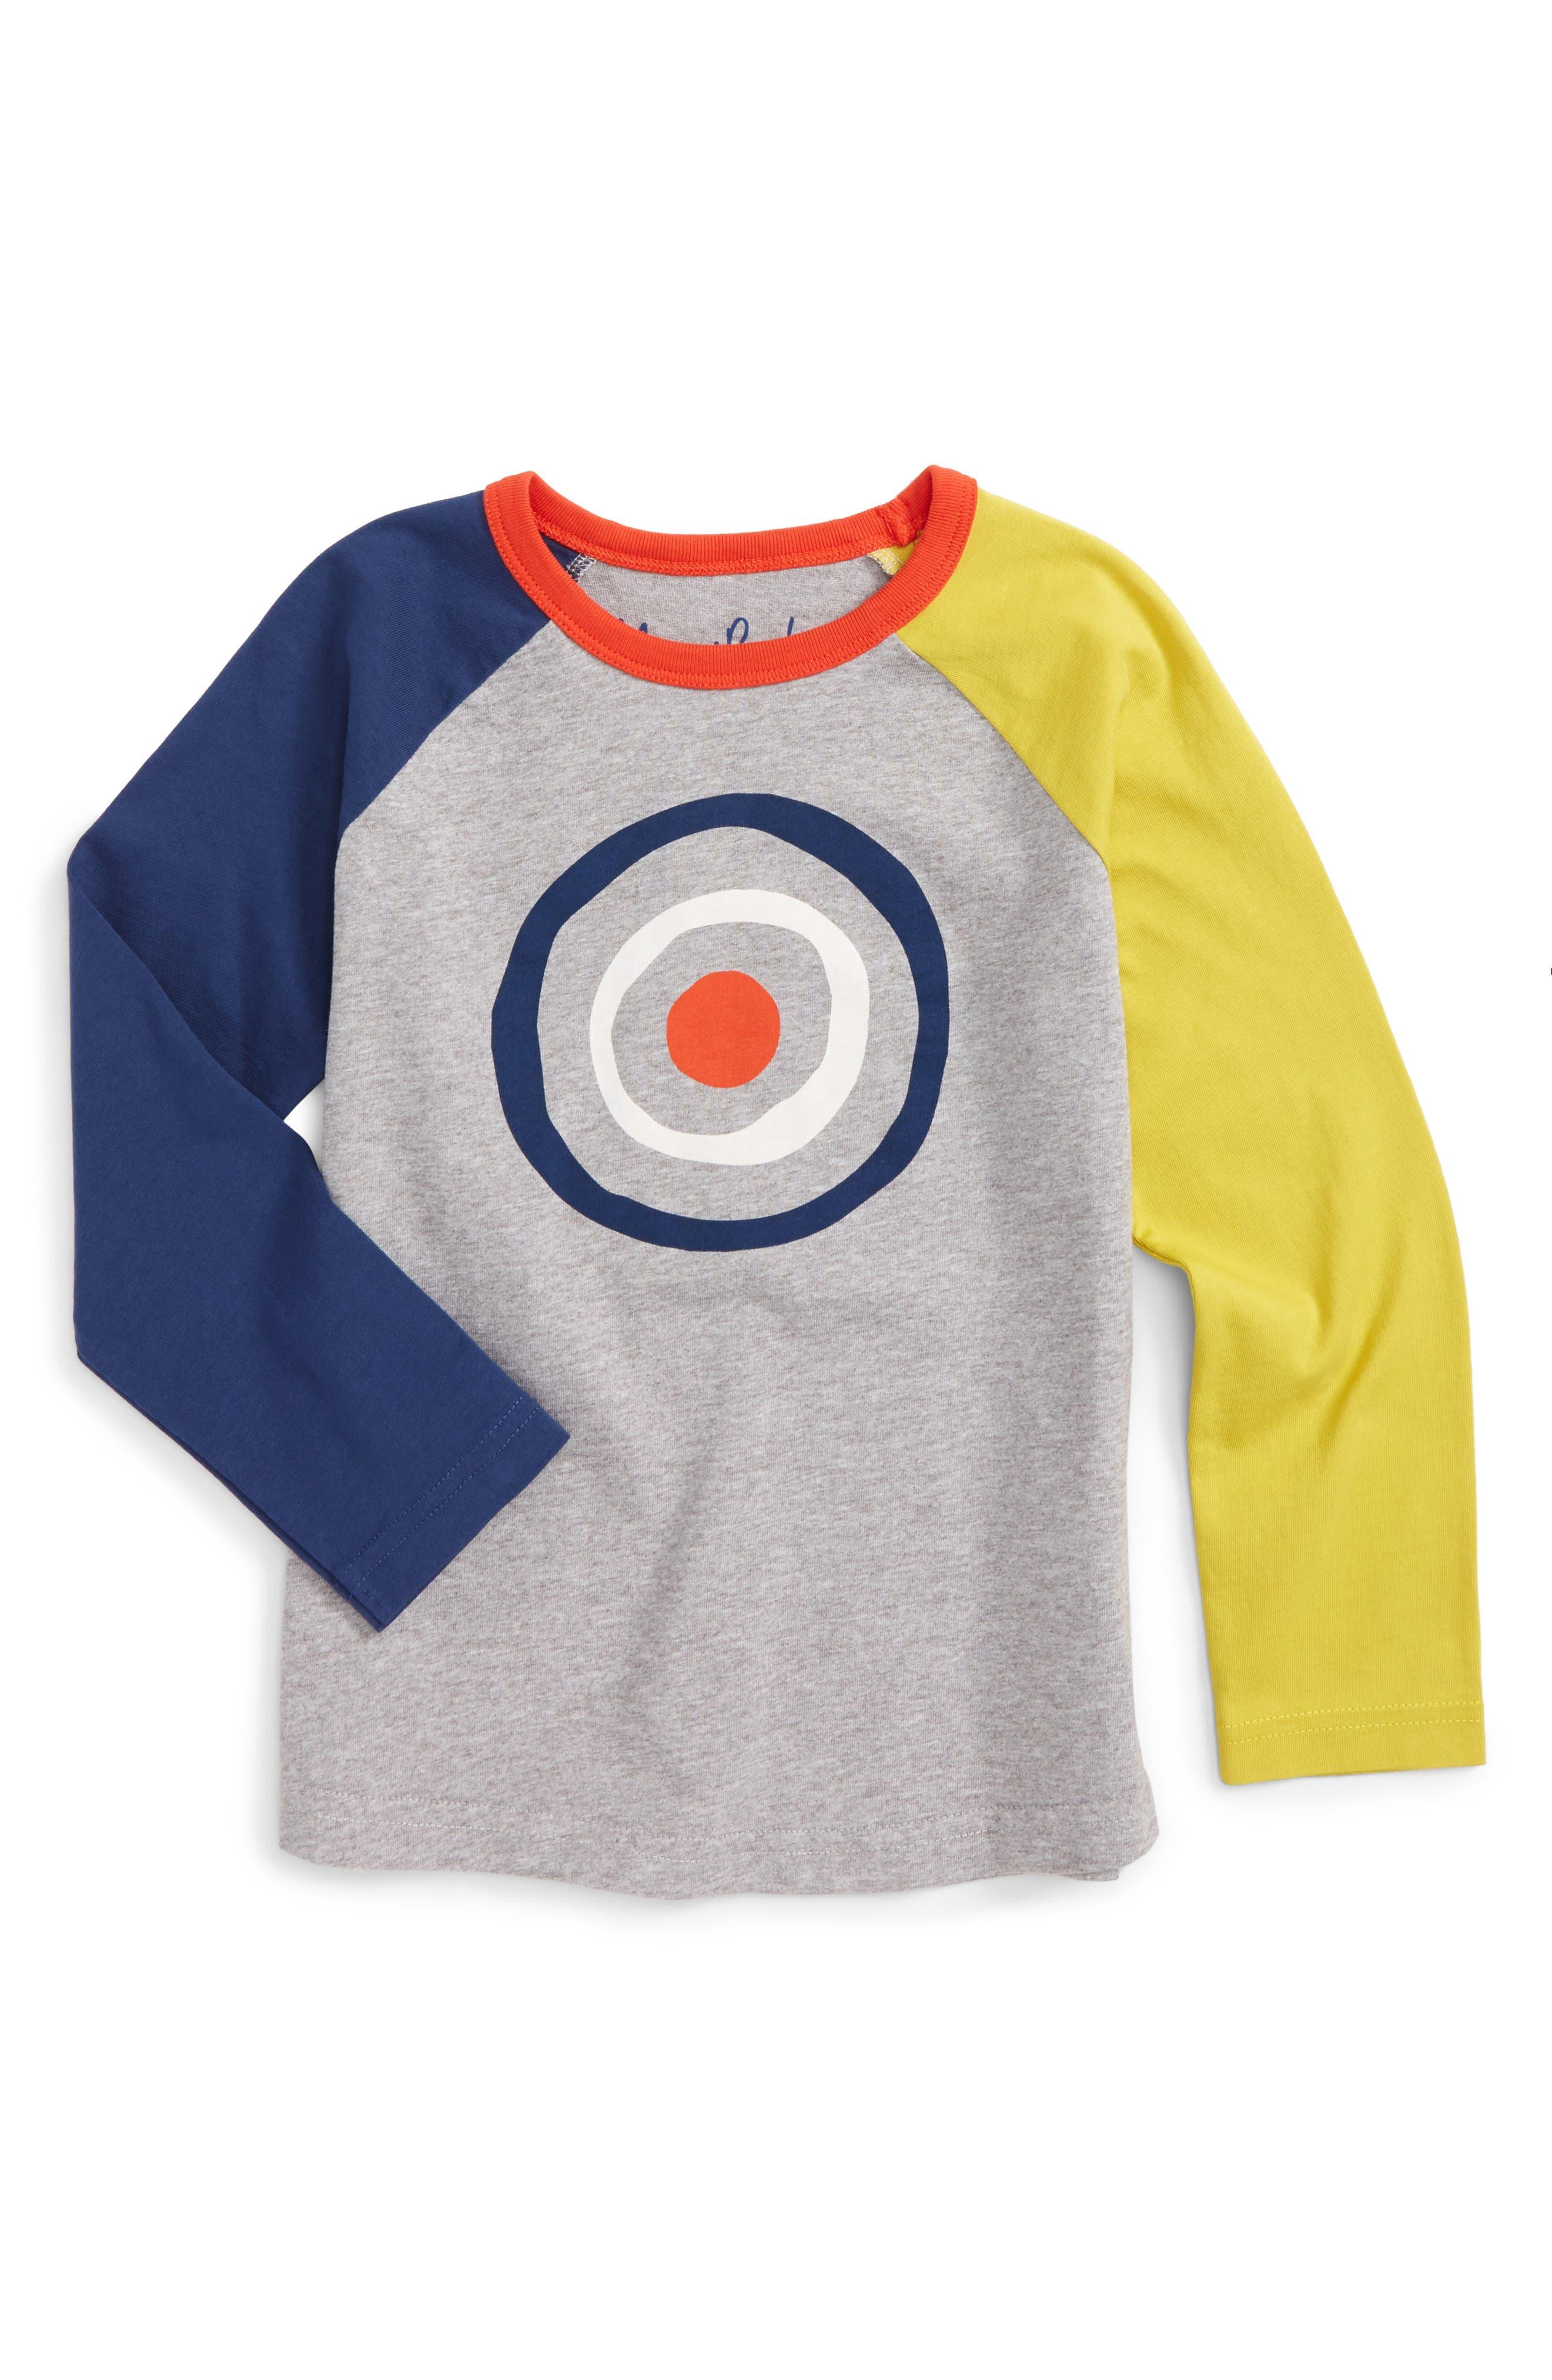 Alternate Image 1 Selected - Mini Boden Hotchpotch T-Shirt (Toddler Boys, Little Boys & Big Boys)